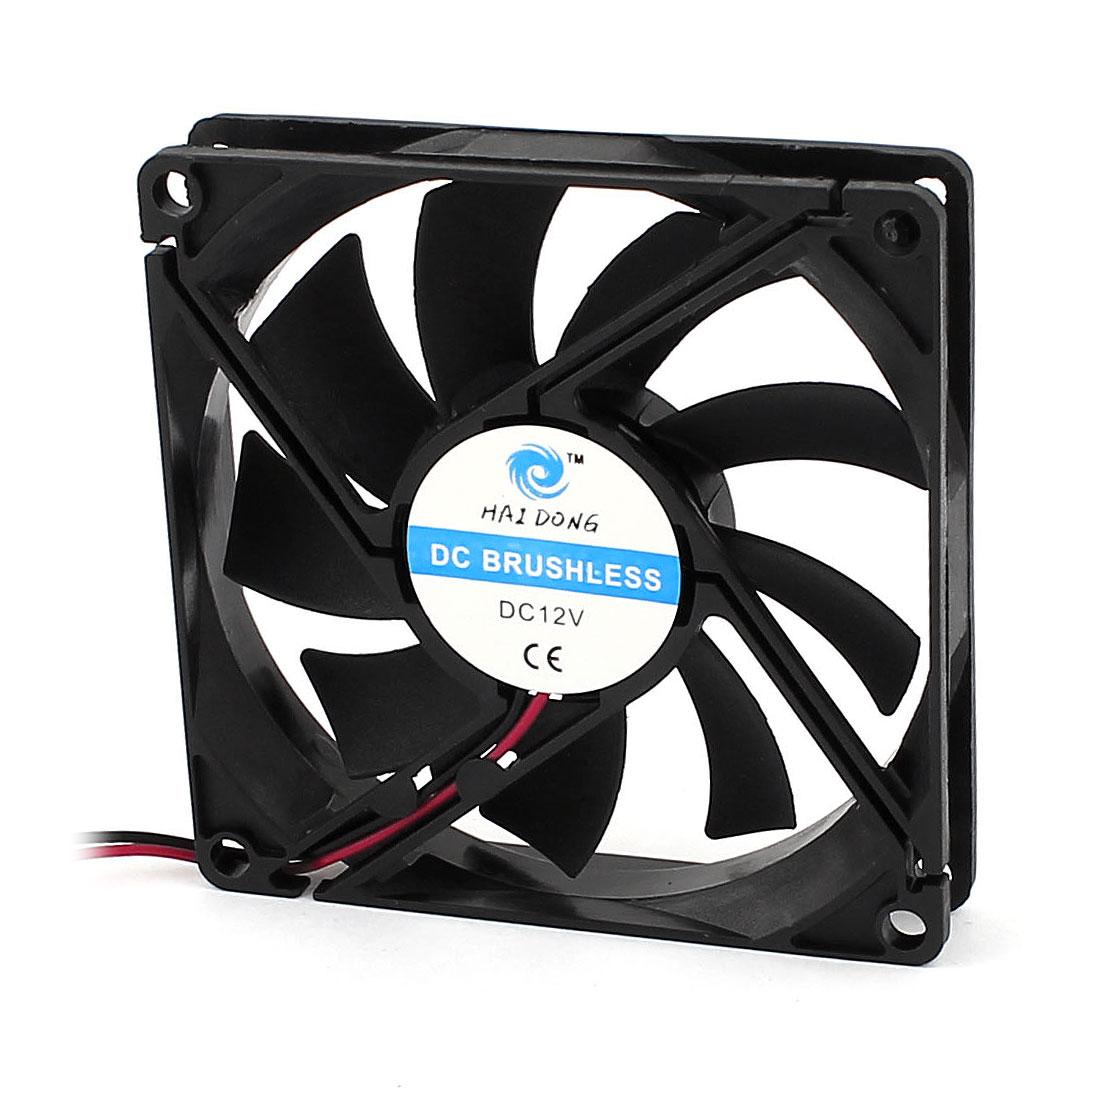 DC 12V 8015 80mmx80mmx15mm Case Cooling Fan CPU Cooler w Dustproof Mesh